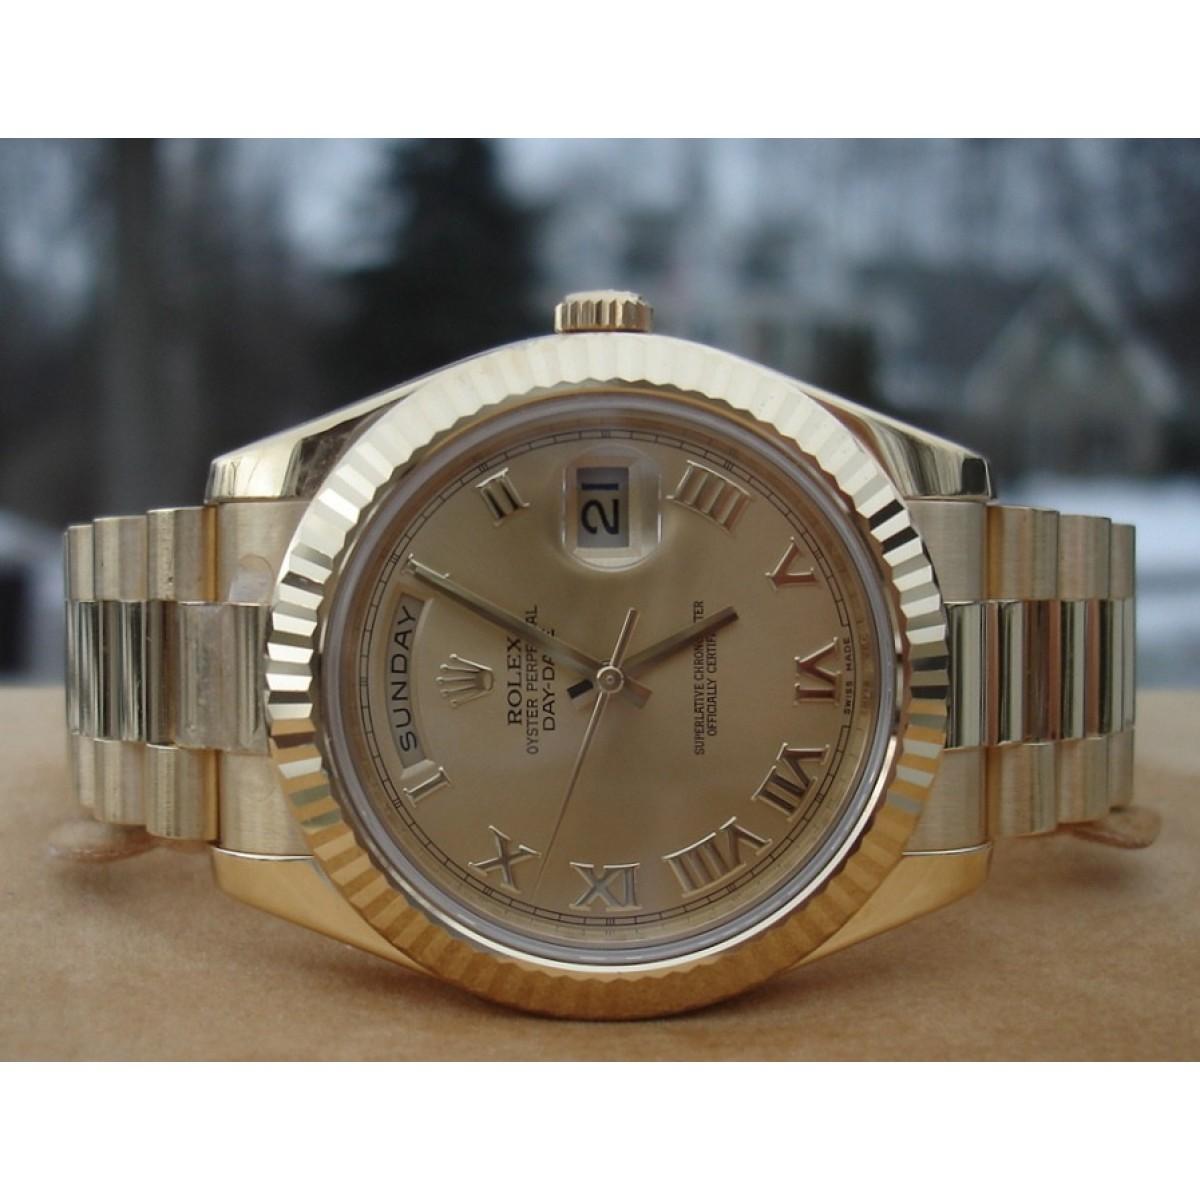 3c659605f97 Relógio Réplica Rolex Day Date Presidente